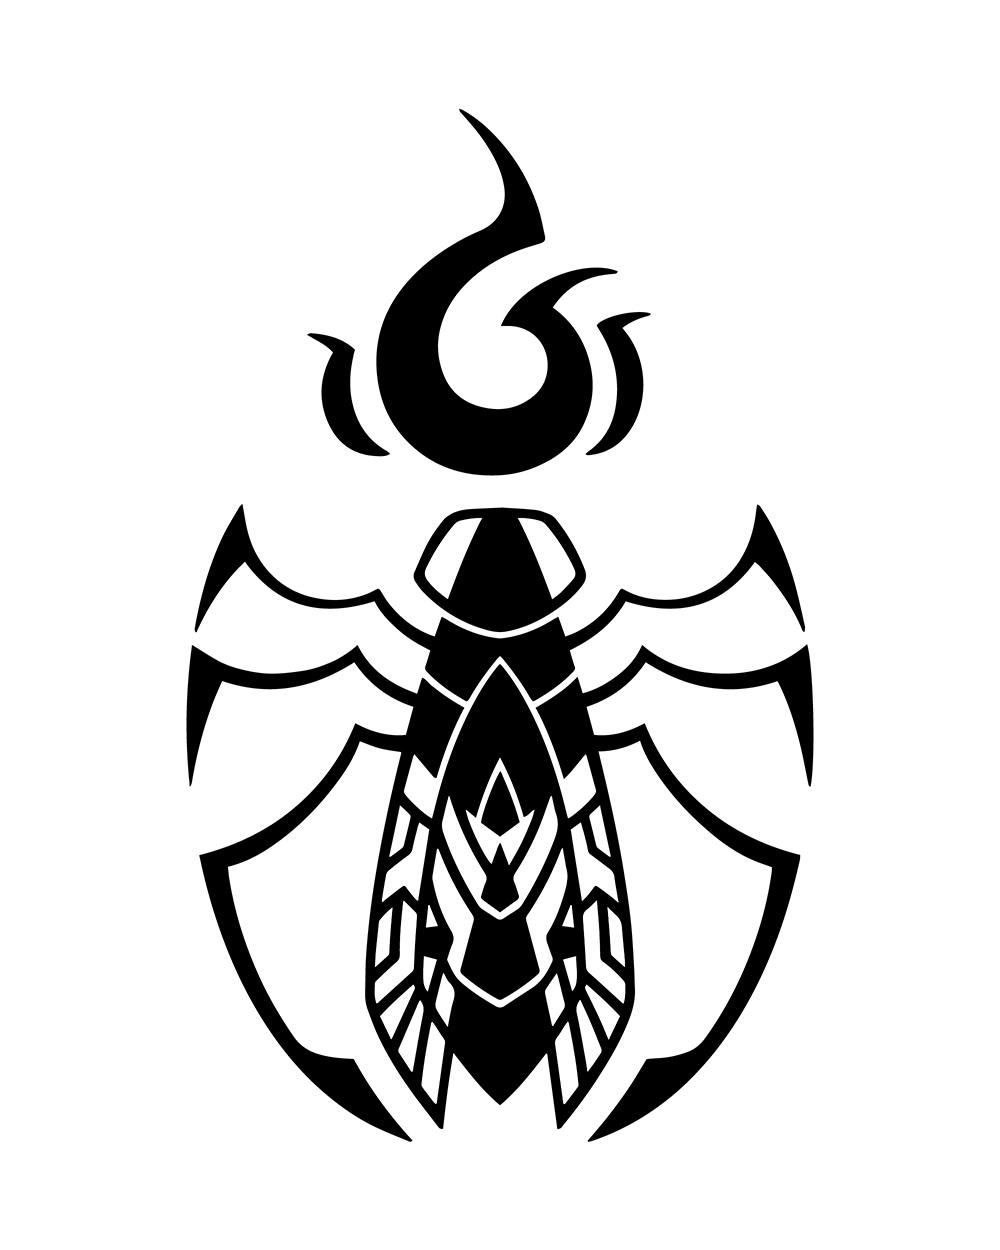 SCP-3063 - 一只苍蝇